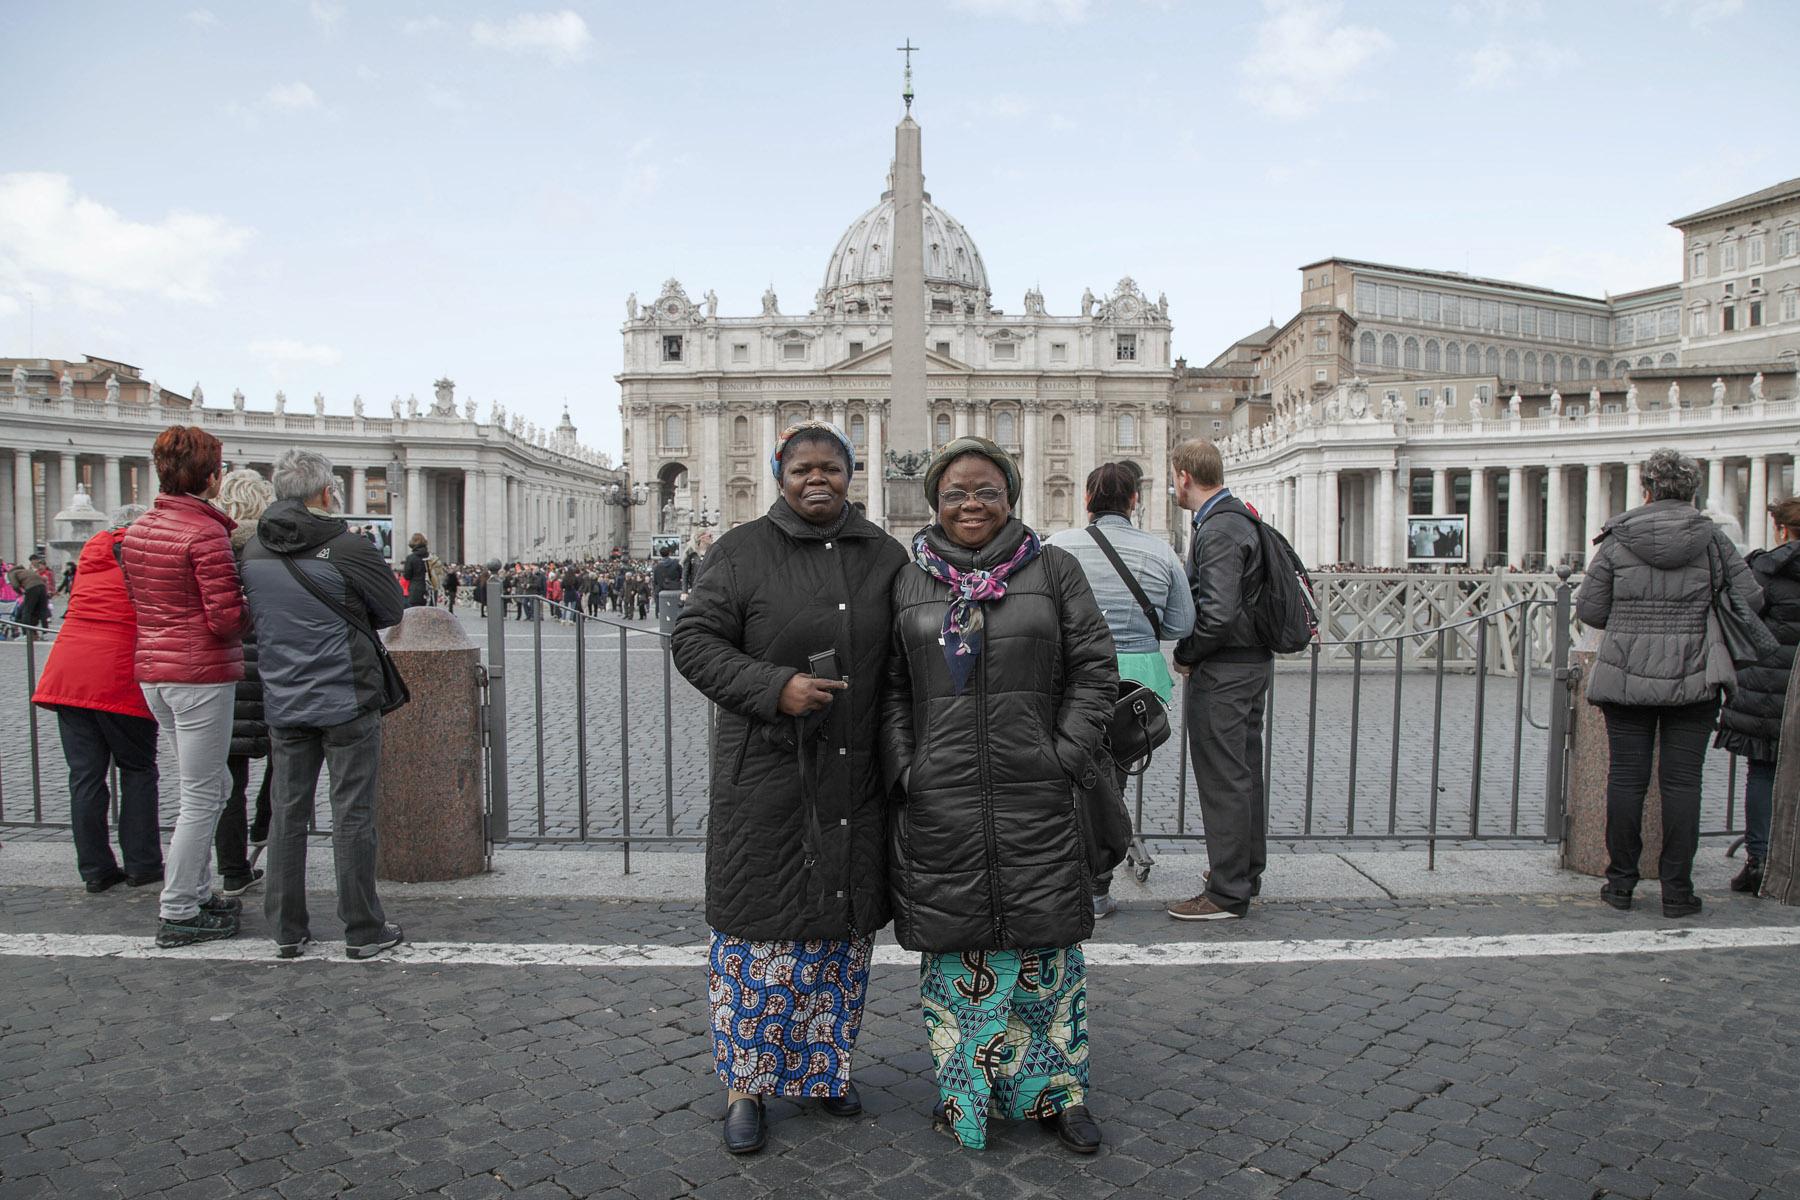 Chiara Spaghetti Kurtovic Popes Two 31